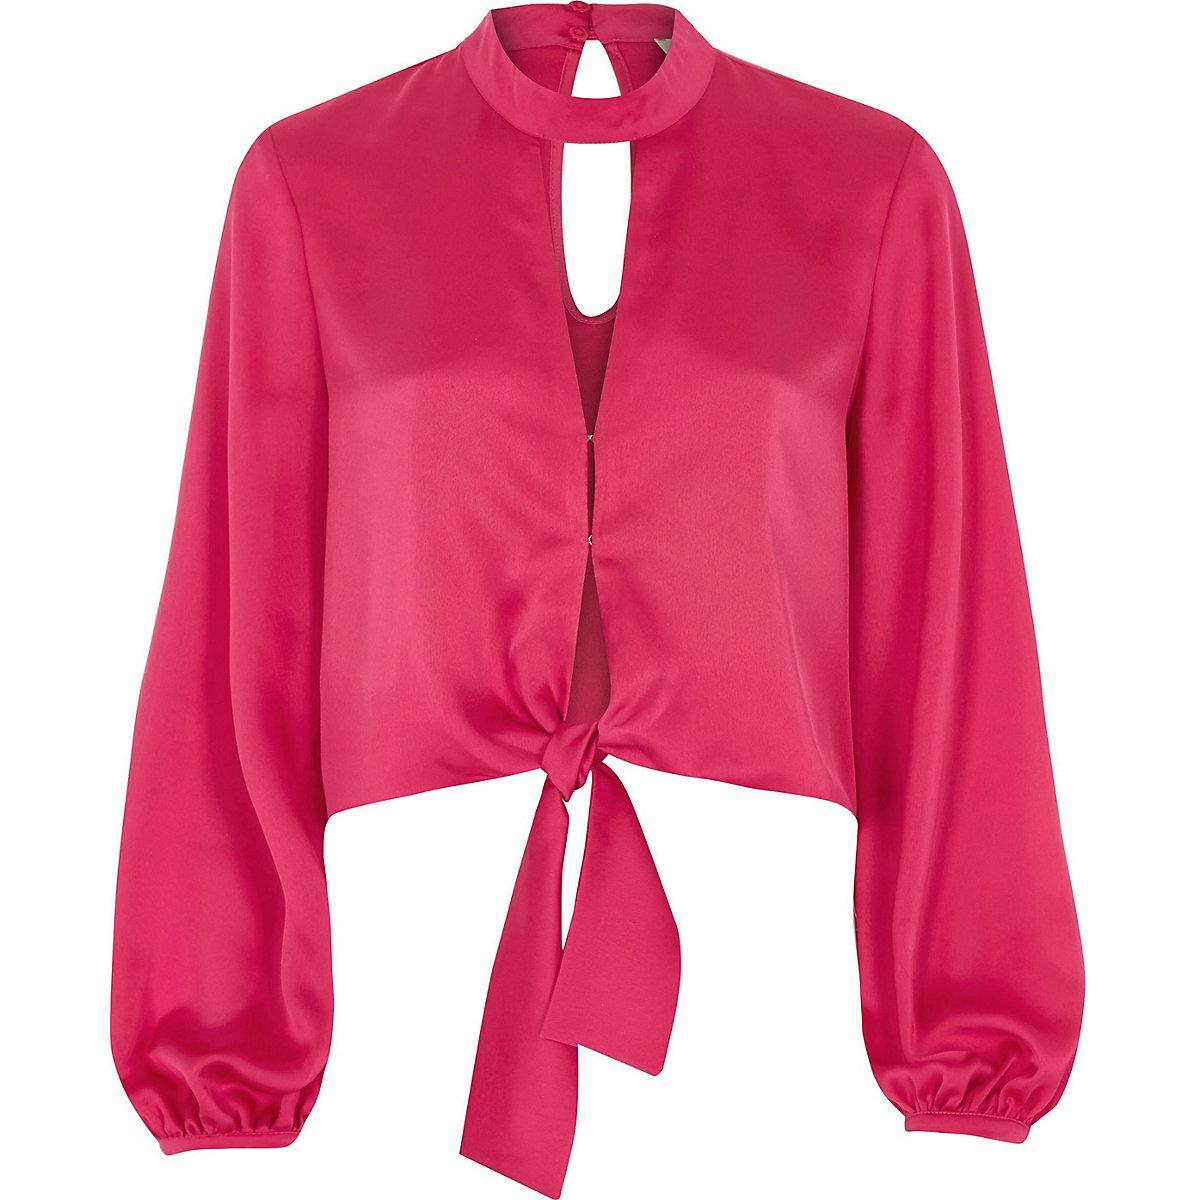 Bright pink satin choker long sleeve crop top